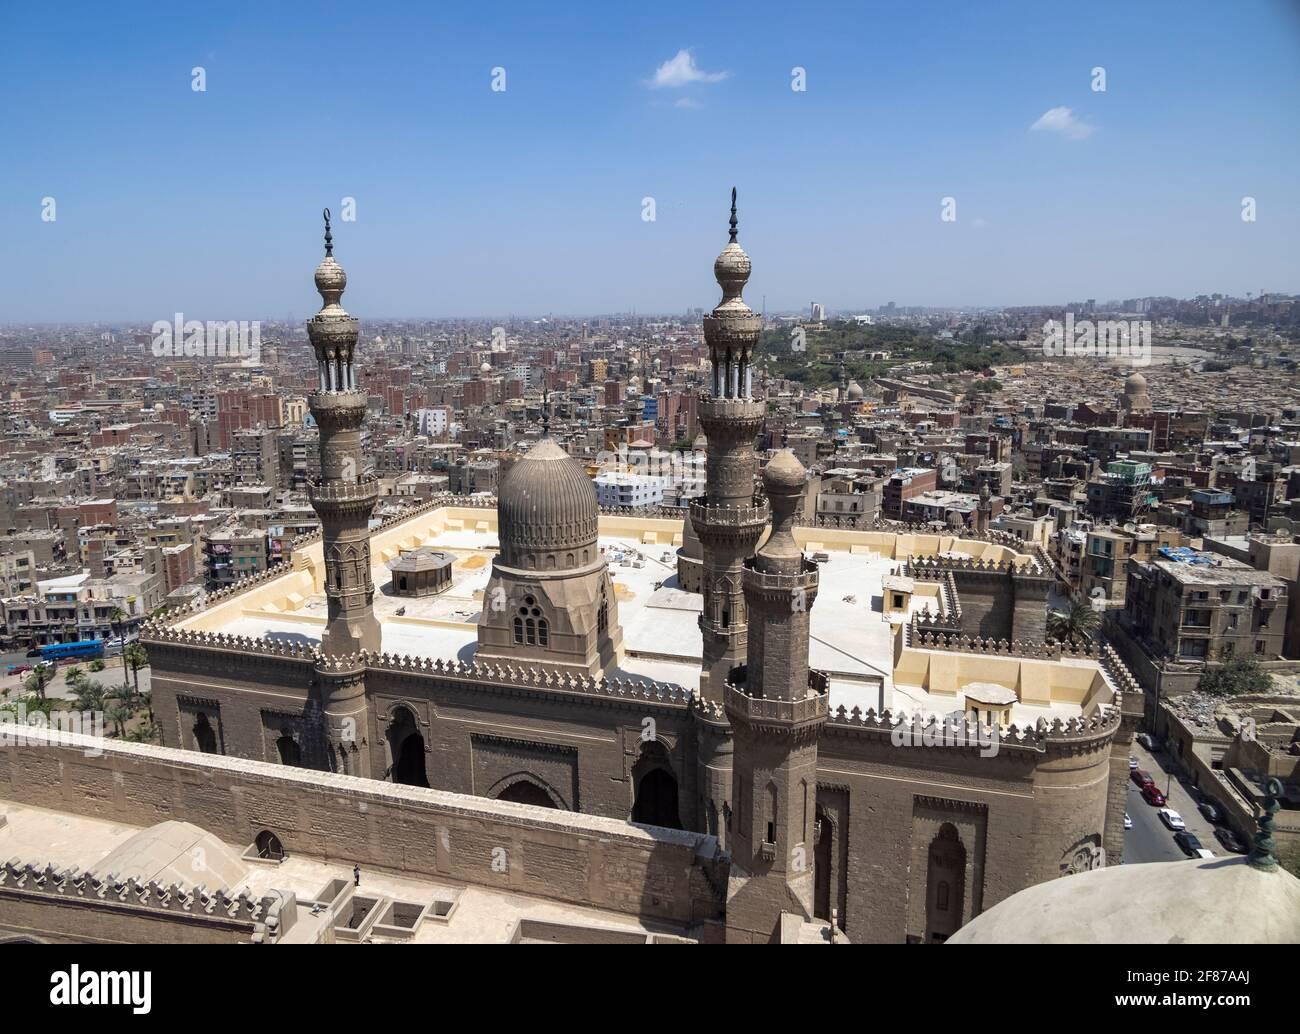 Mosque of al-Rifa'i, Cairo, Egypt Stock Photo